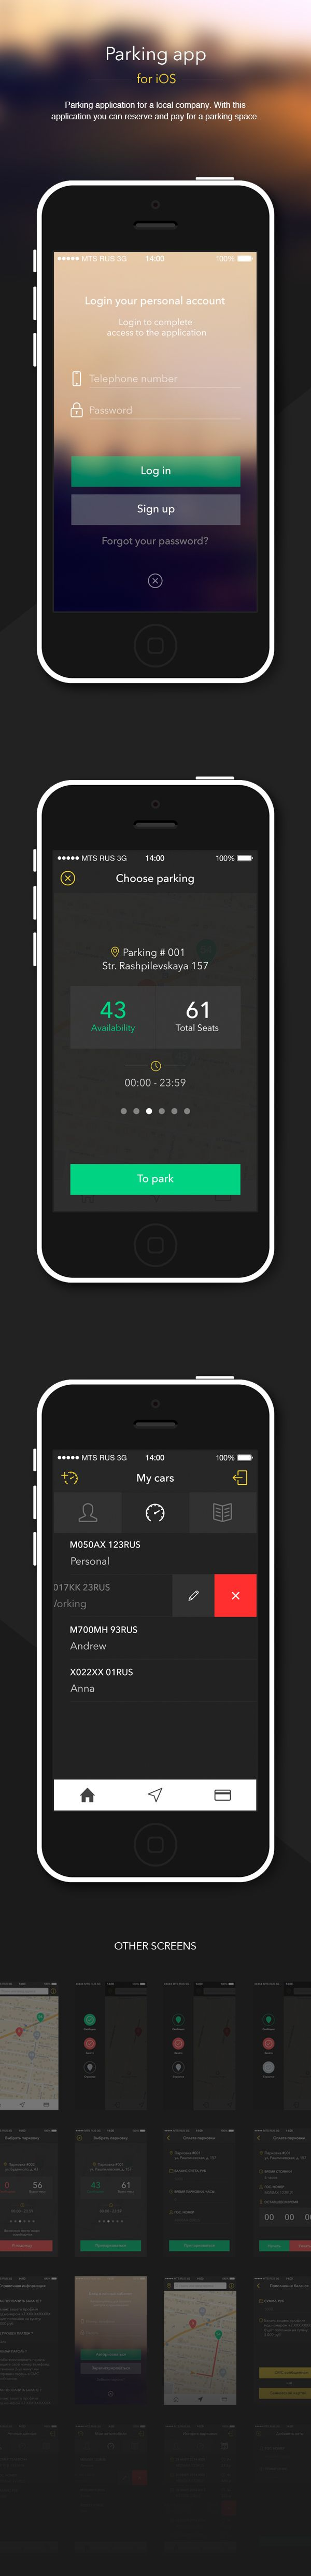 Parking app iOS by Maxim Sorokin, via Behance